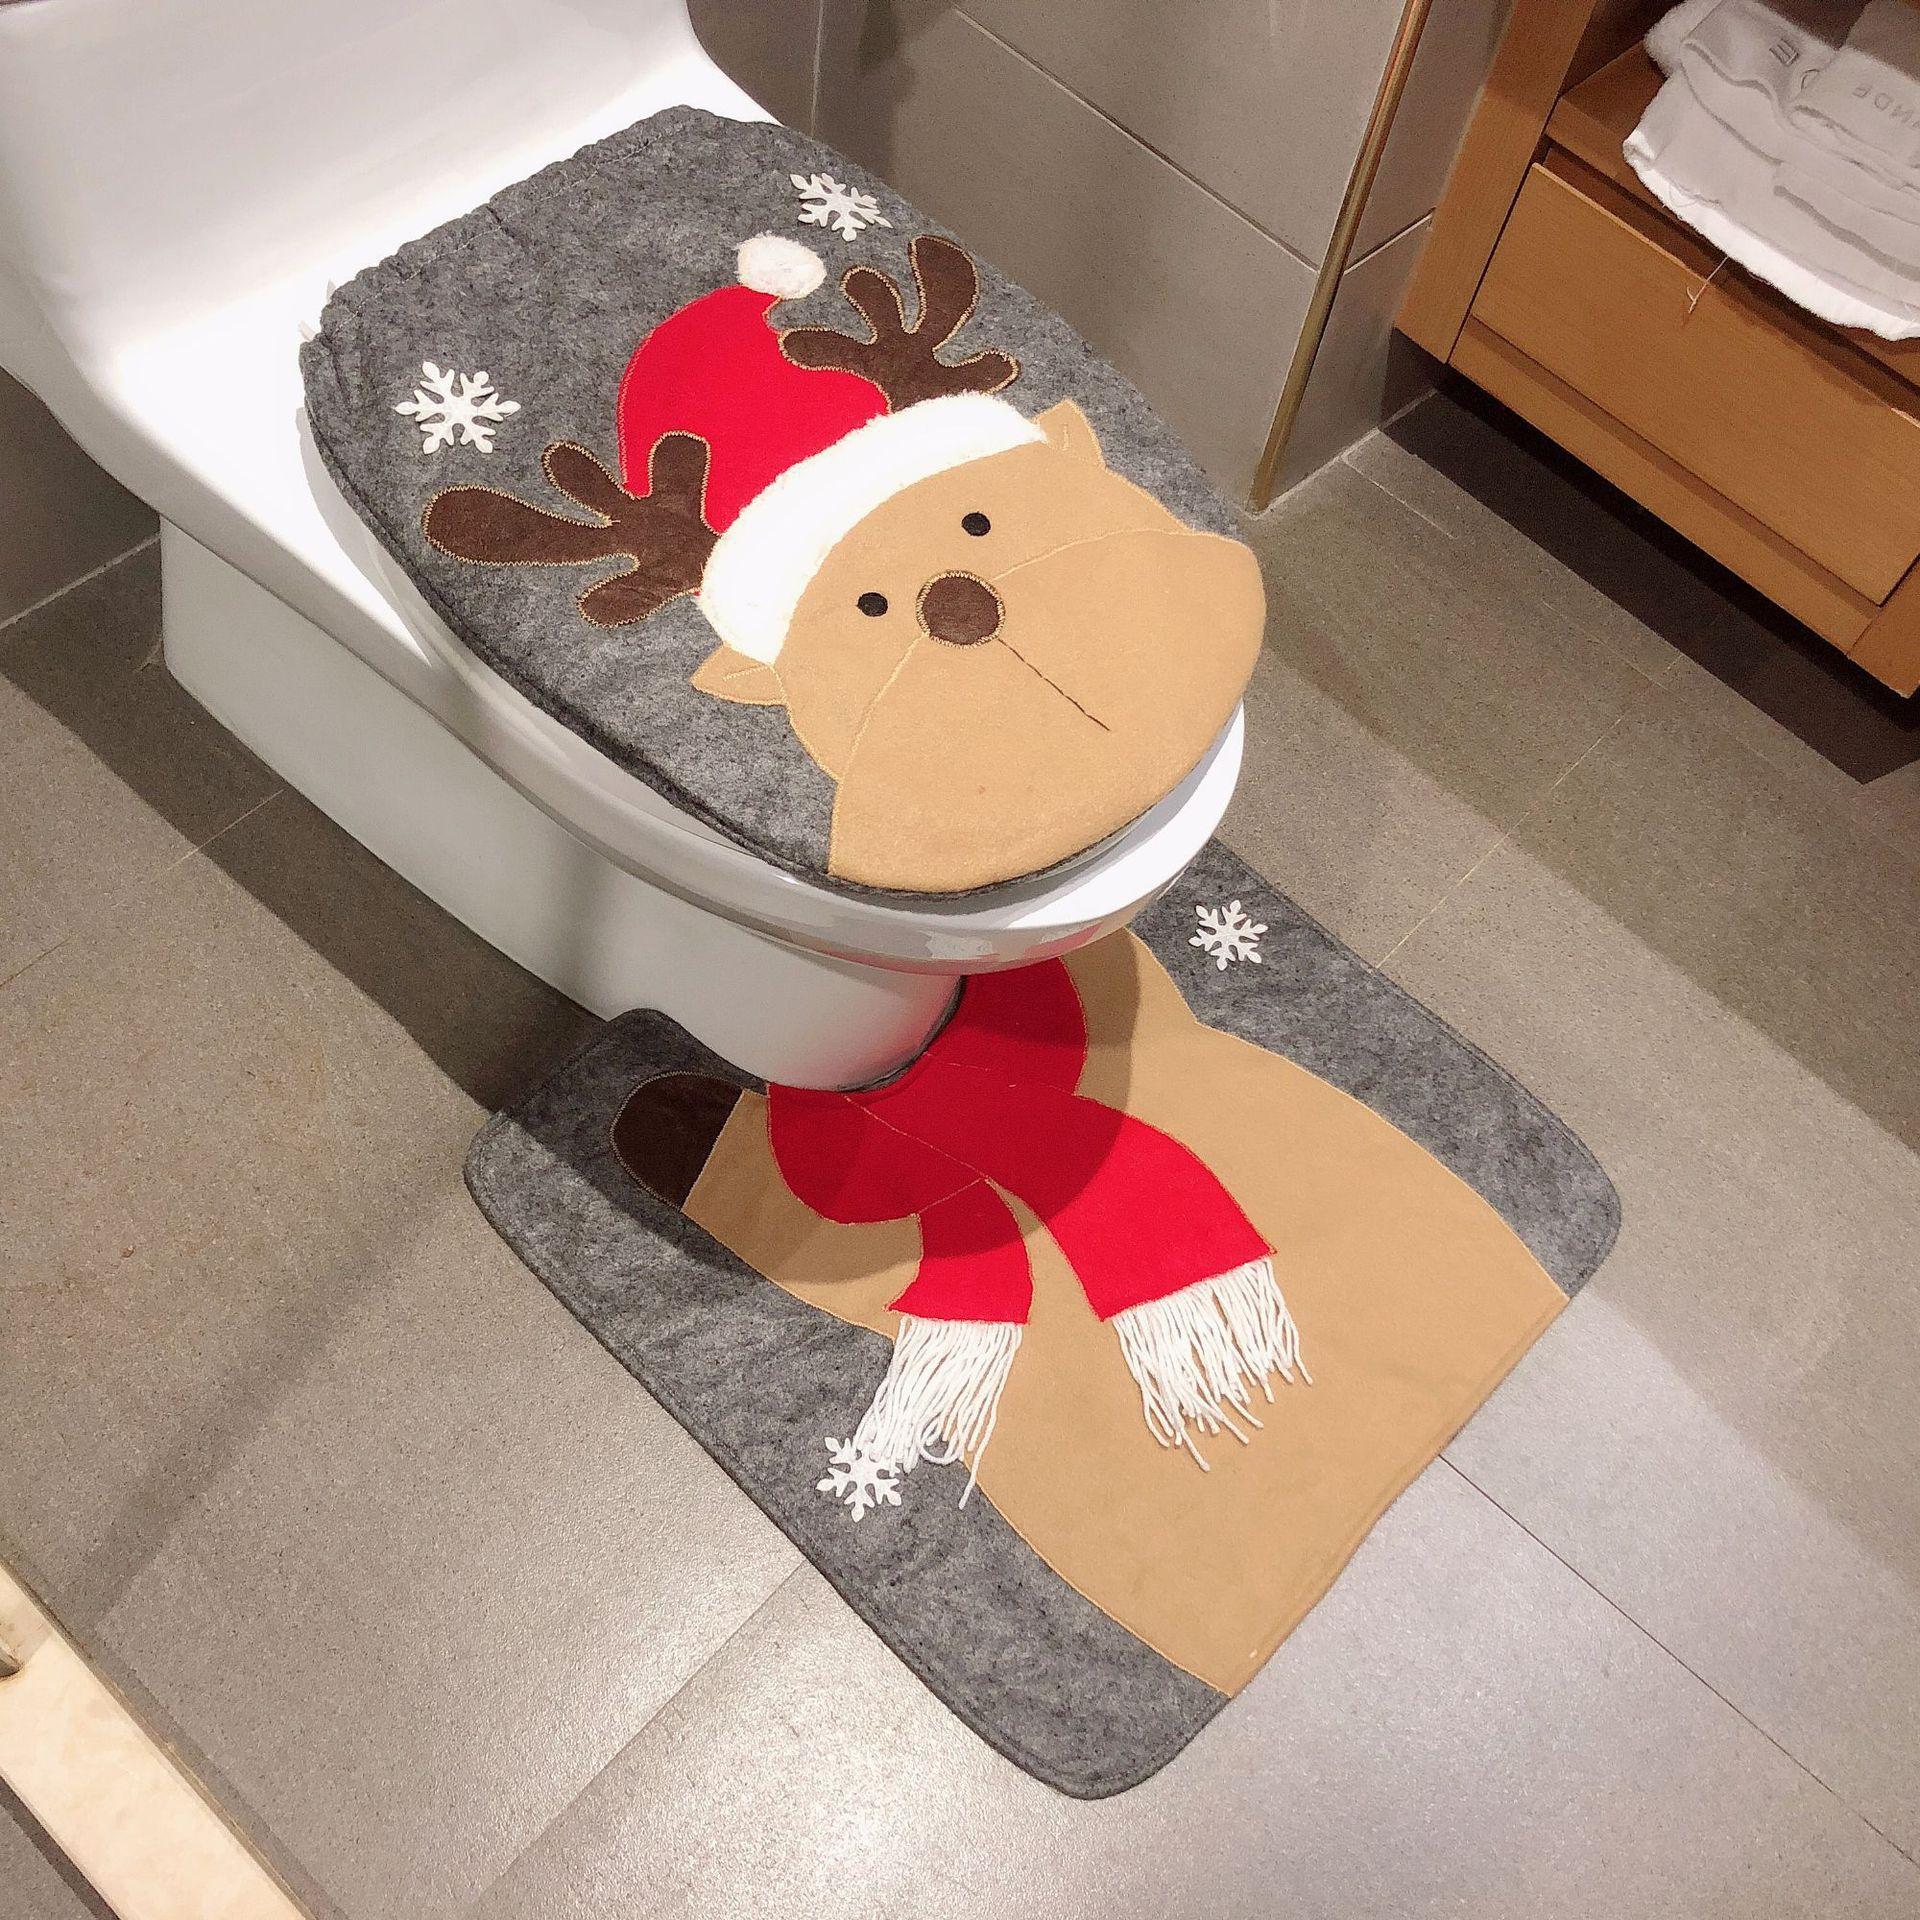 Christmas Toilet Two-piece Set Exquisite Christmas Snowman Elk Toilet Seat Cushion Santa Claus Toilet Cover  6